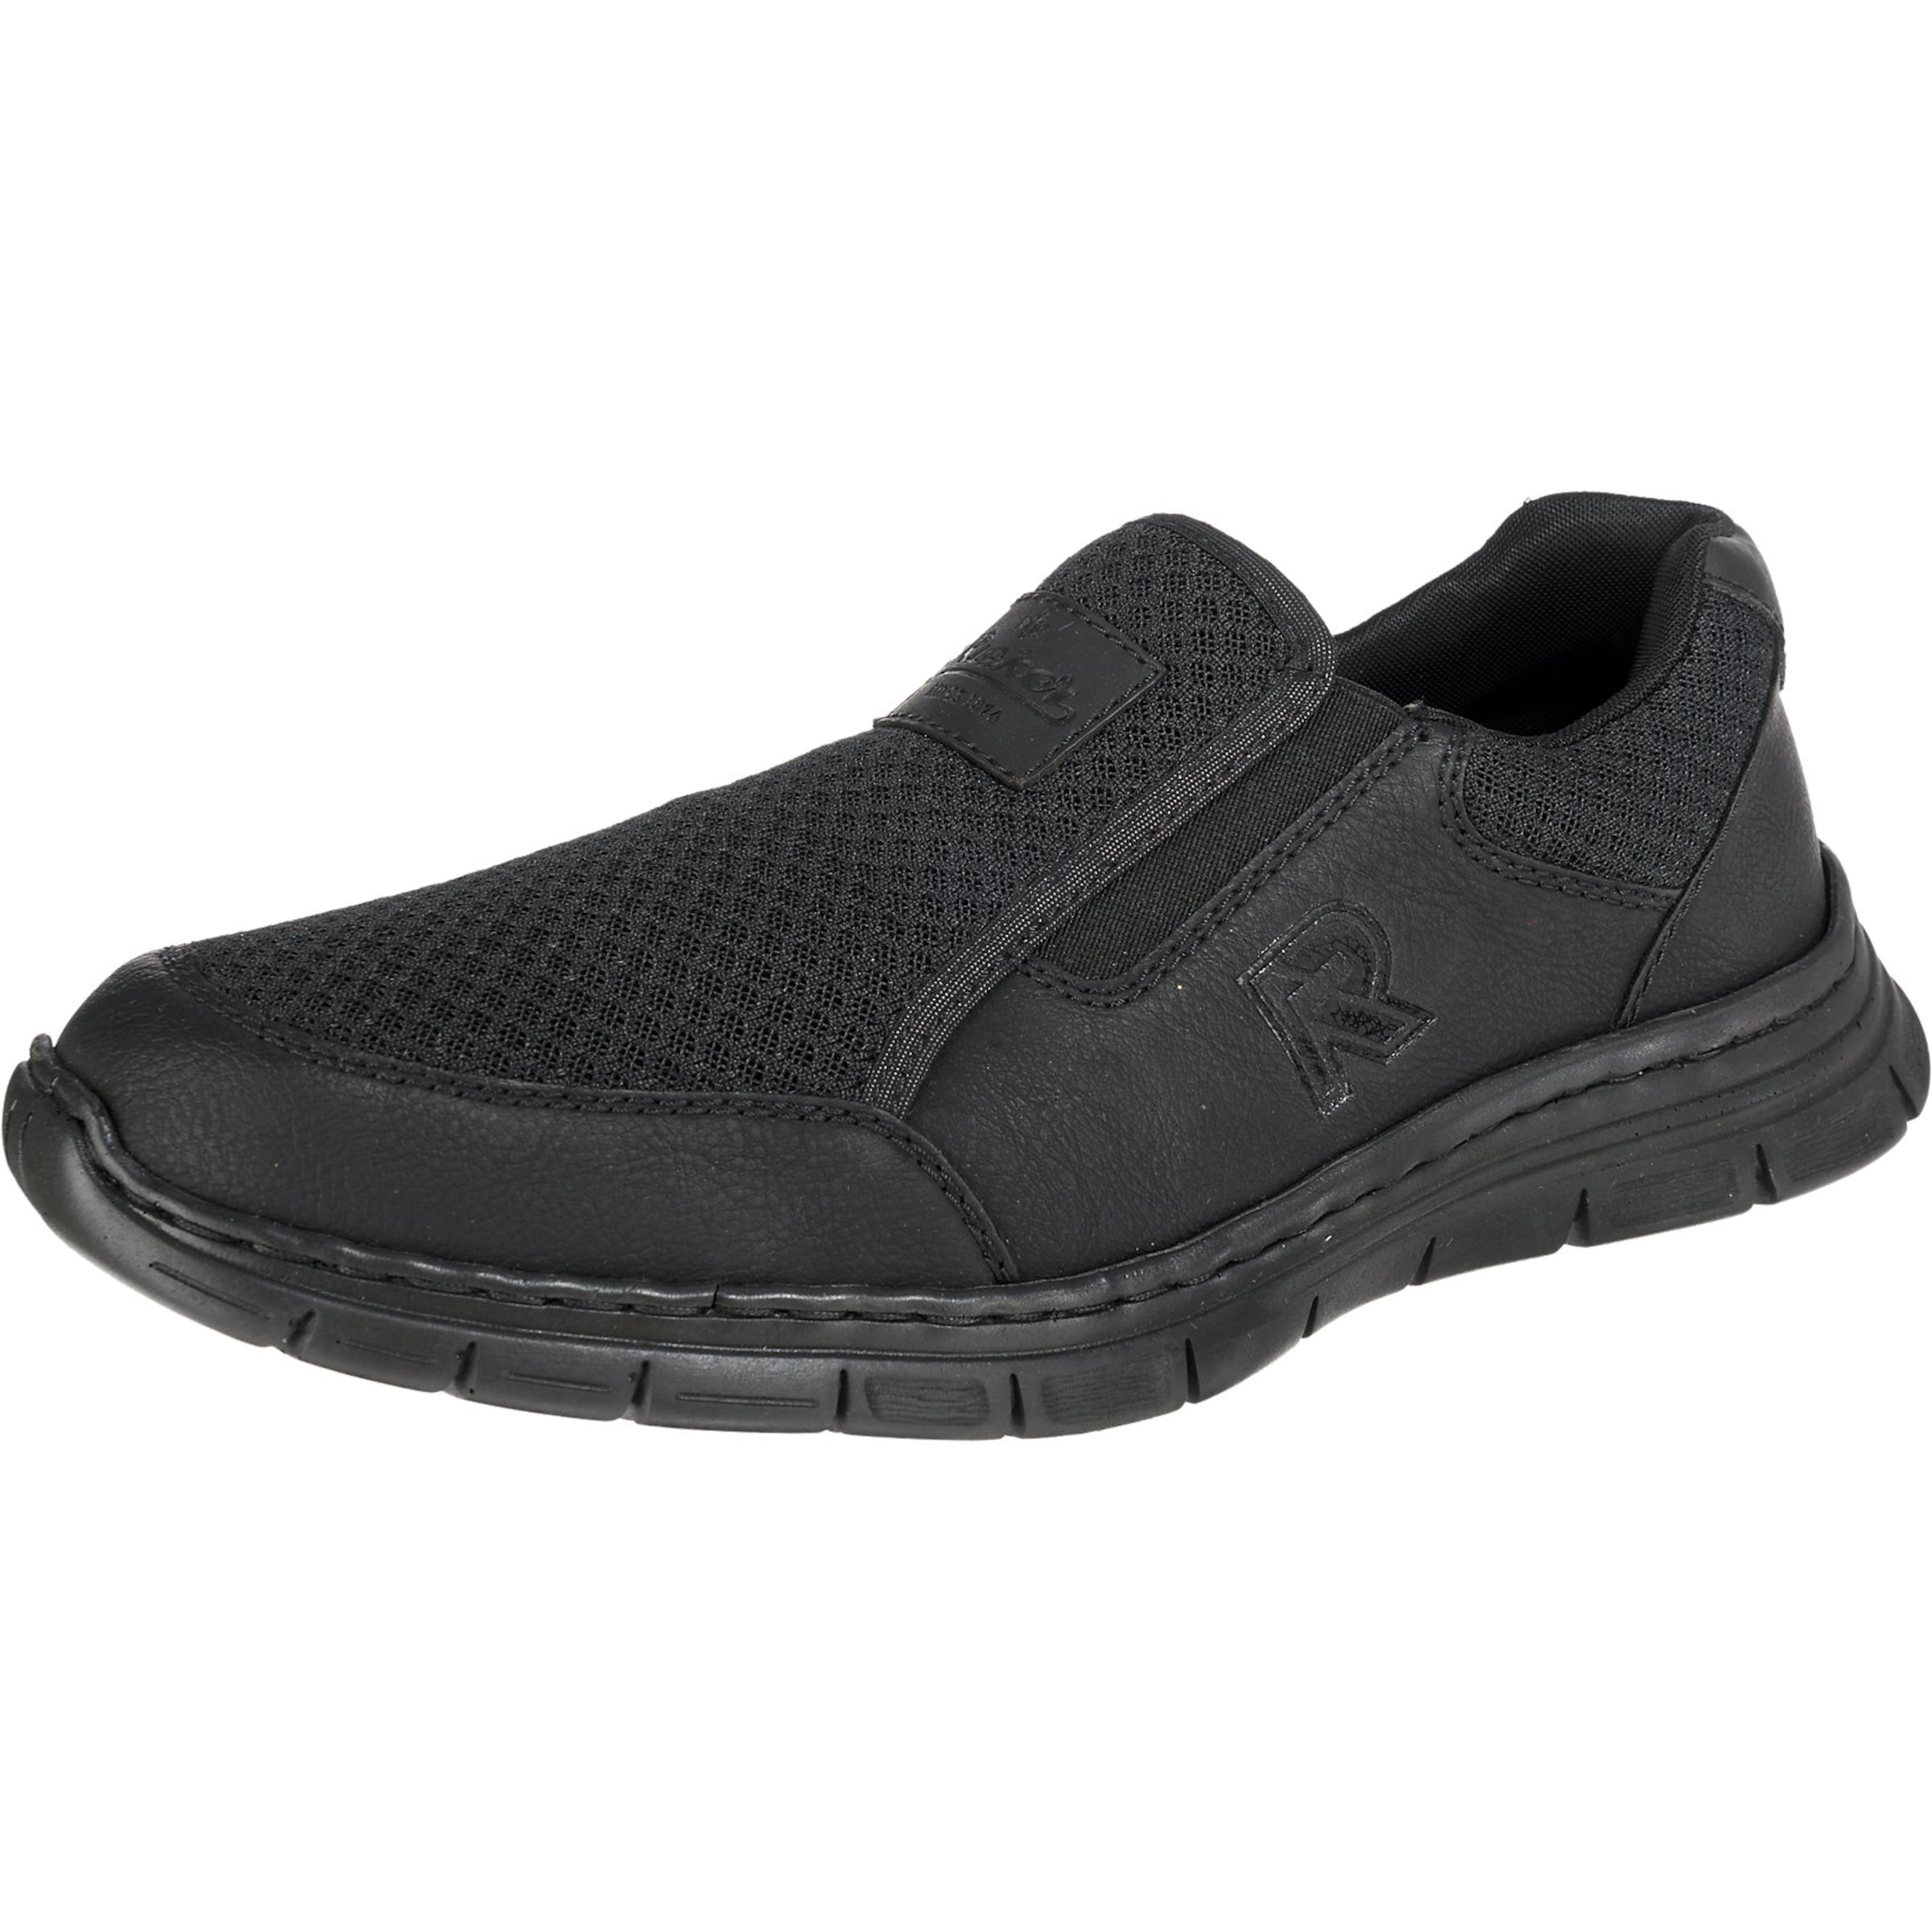 Haltbare Mode billige Schuhe RIEKER | Slip-On Sneaker Schuhe Gut getragene Schuhe